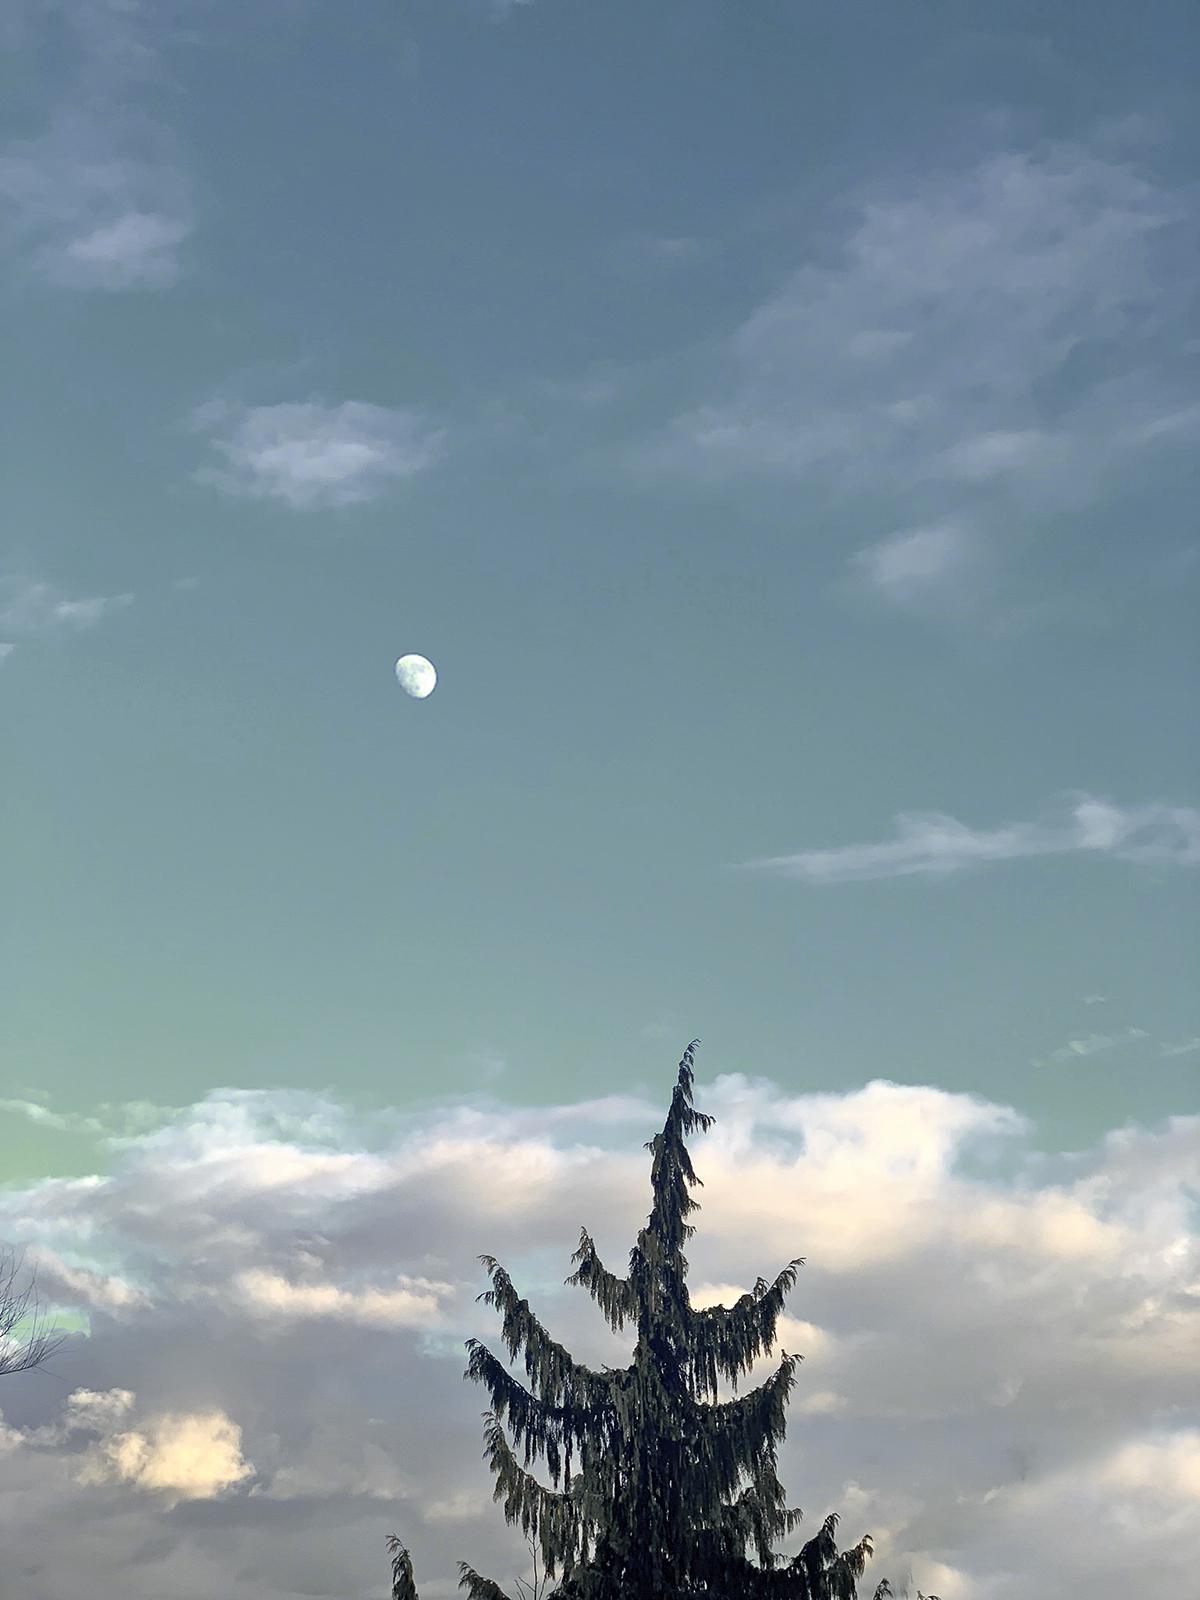 Lune en plein jour, sapin